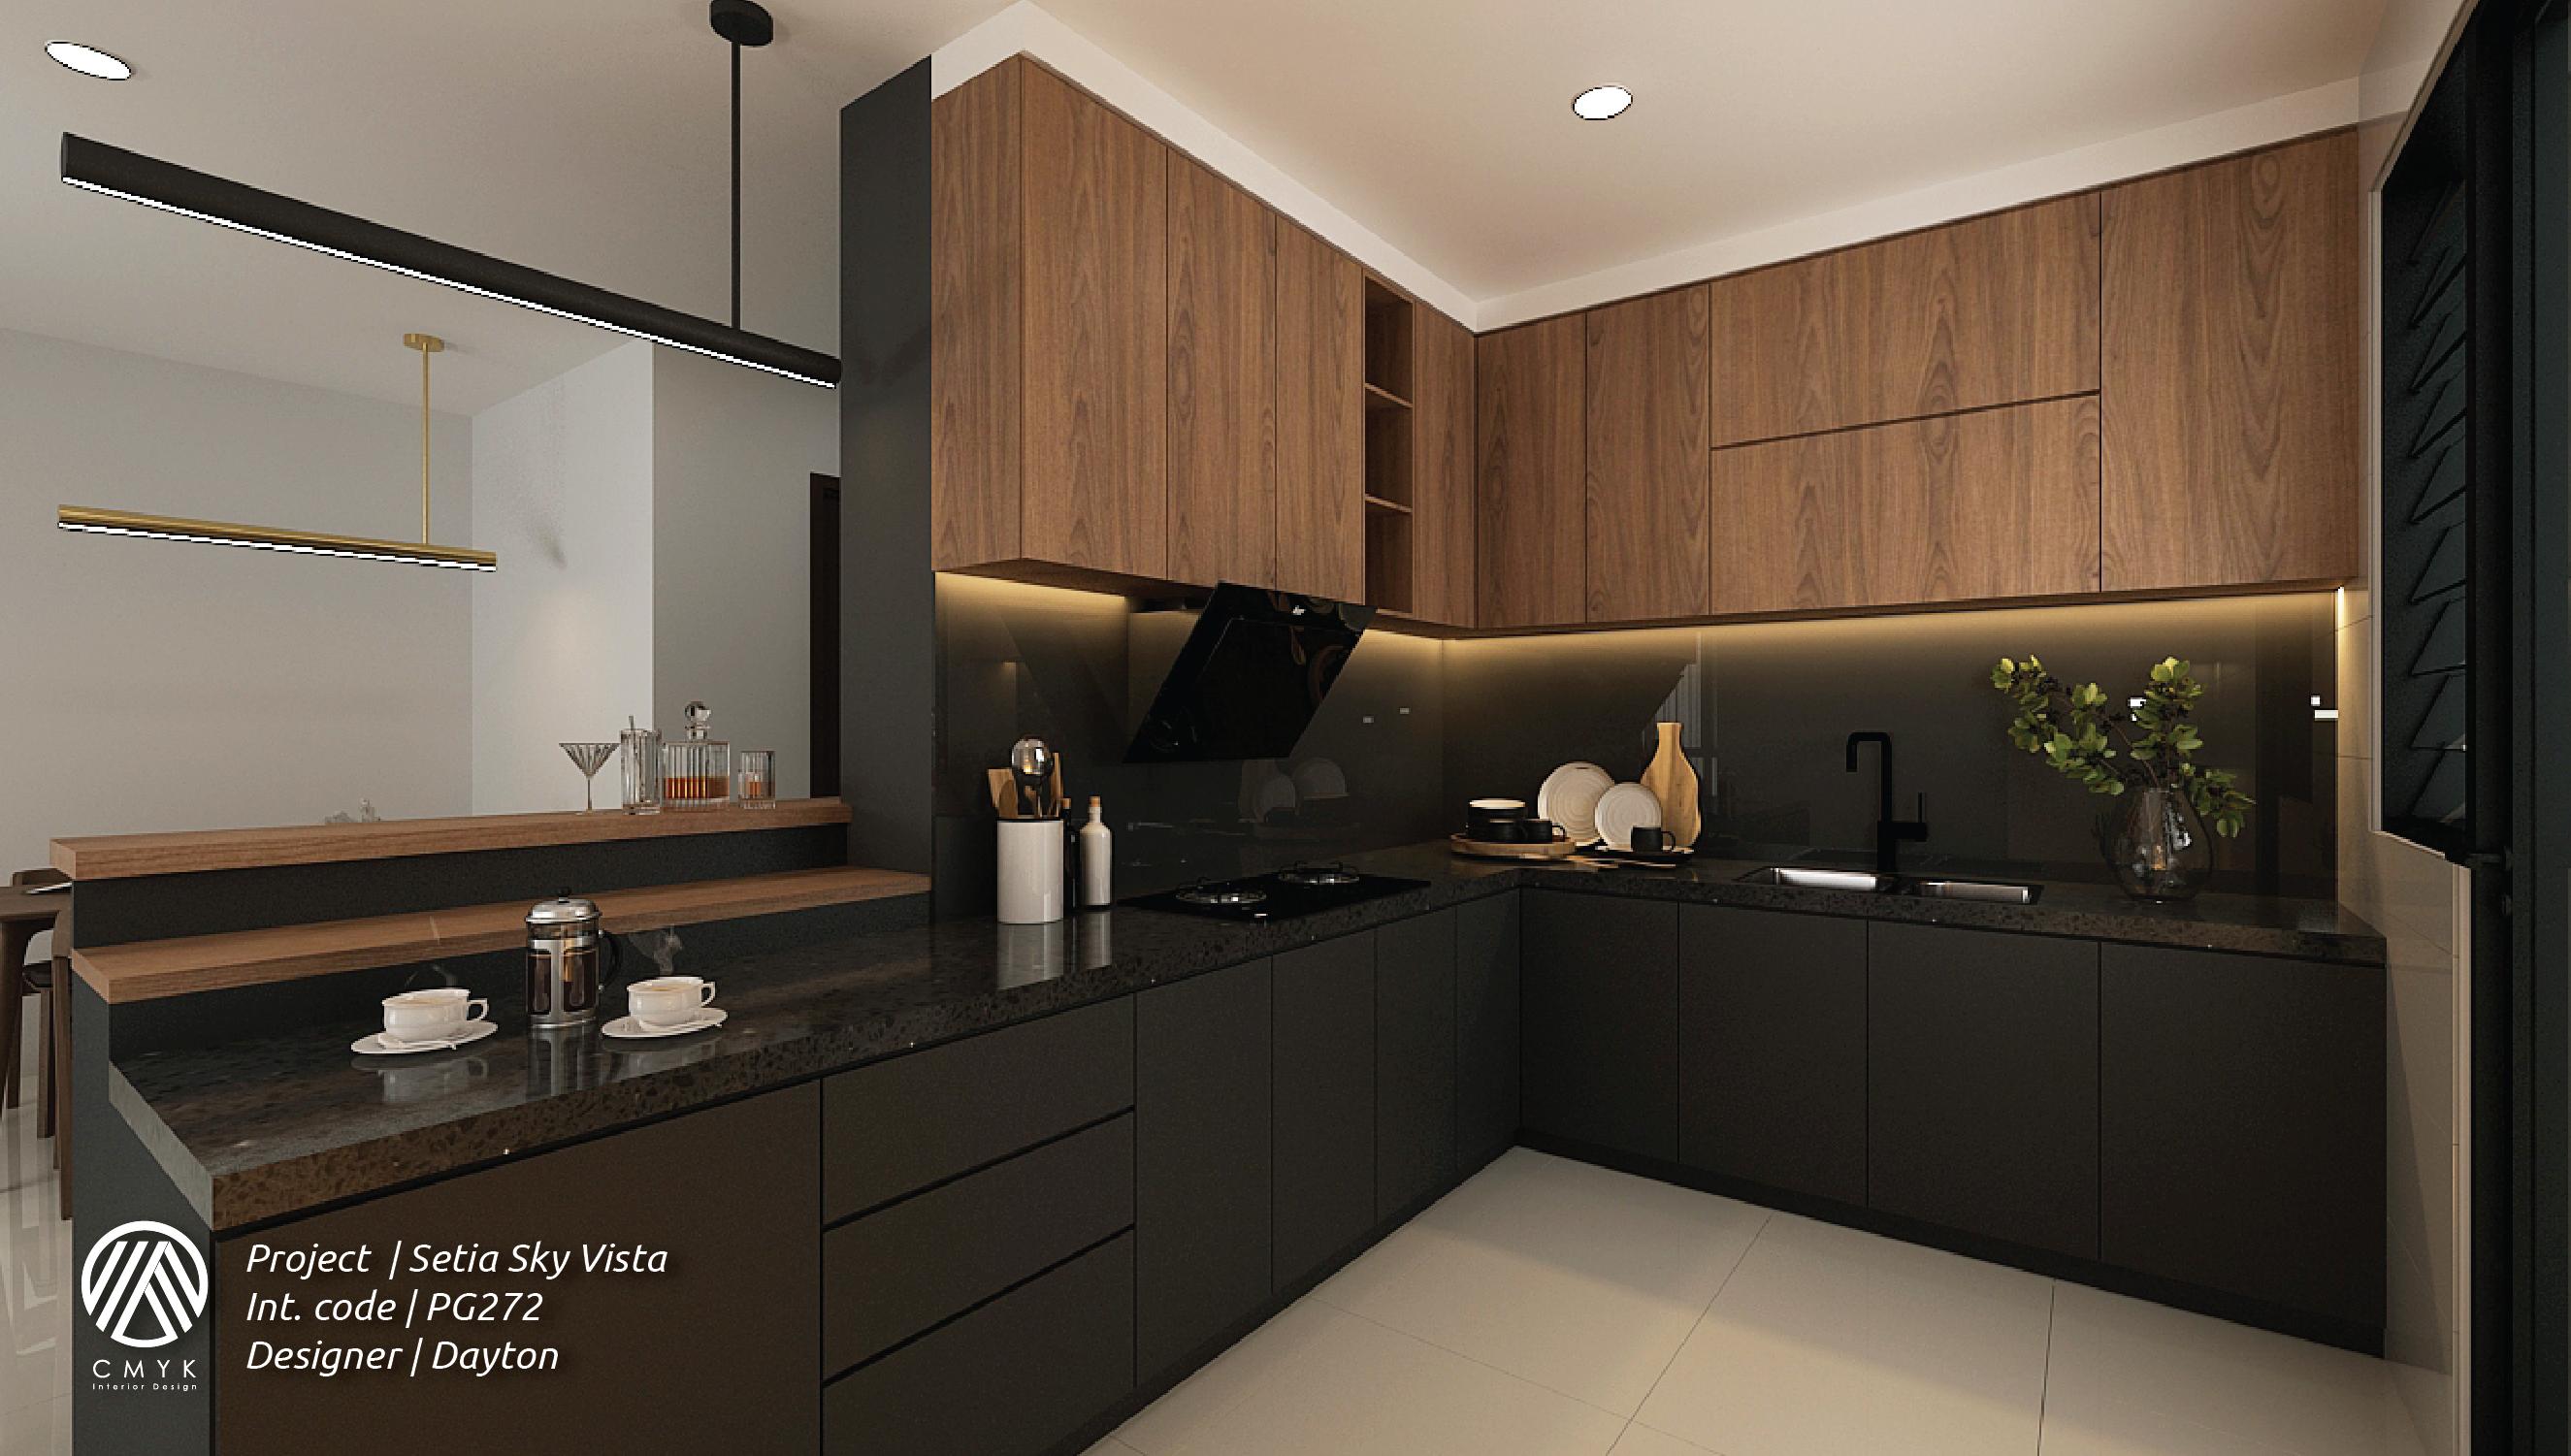 Residential   Penang   Setia Sky Vista-16120066502.jpg